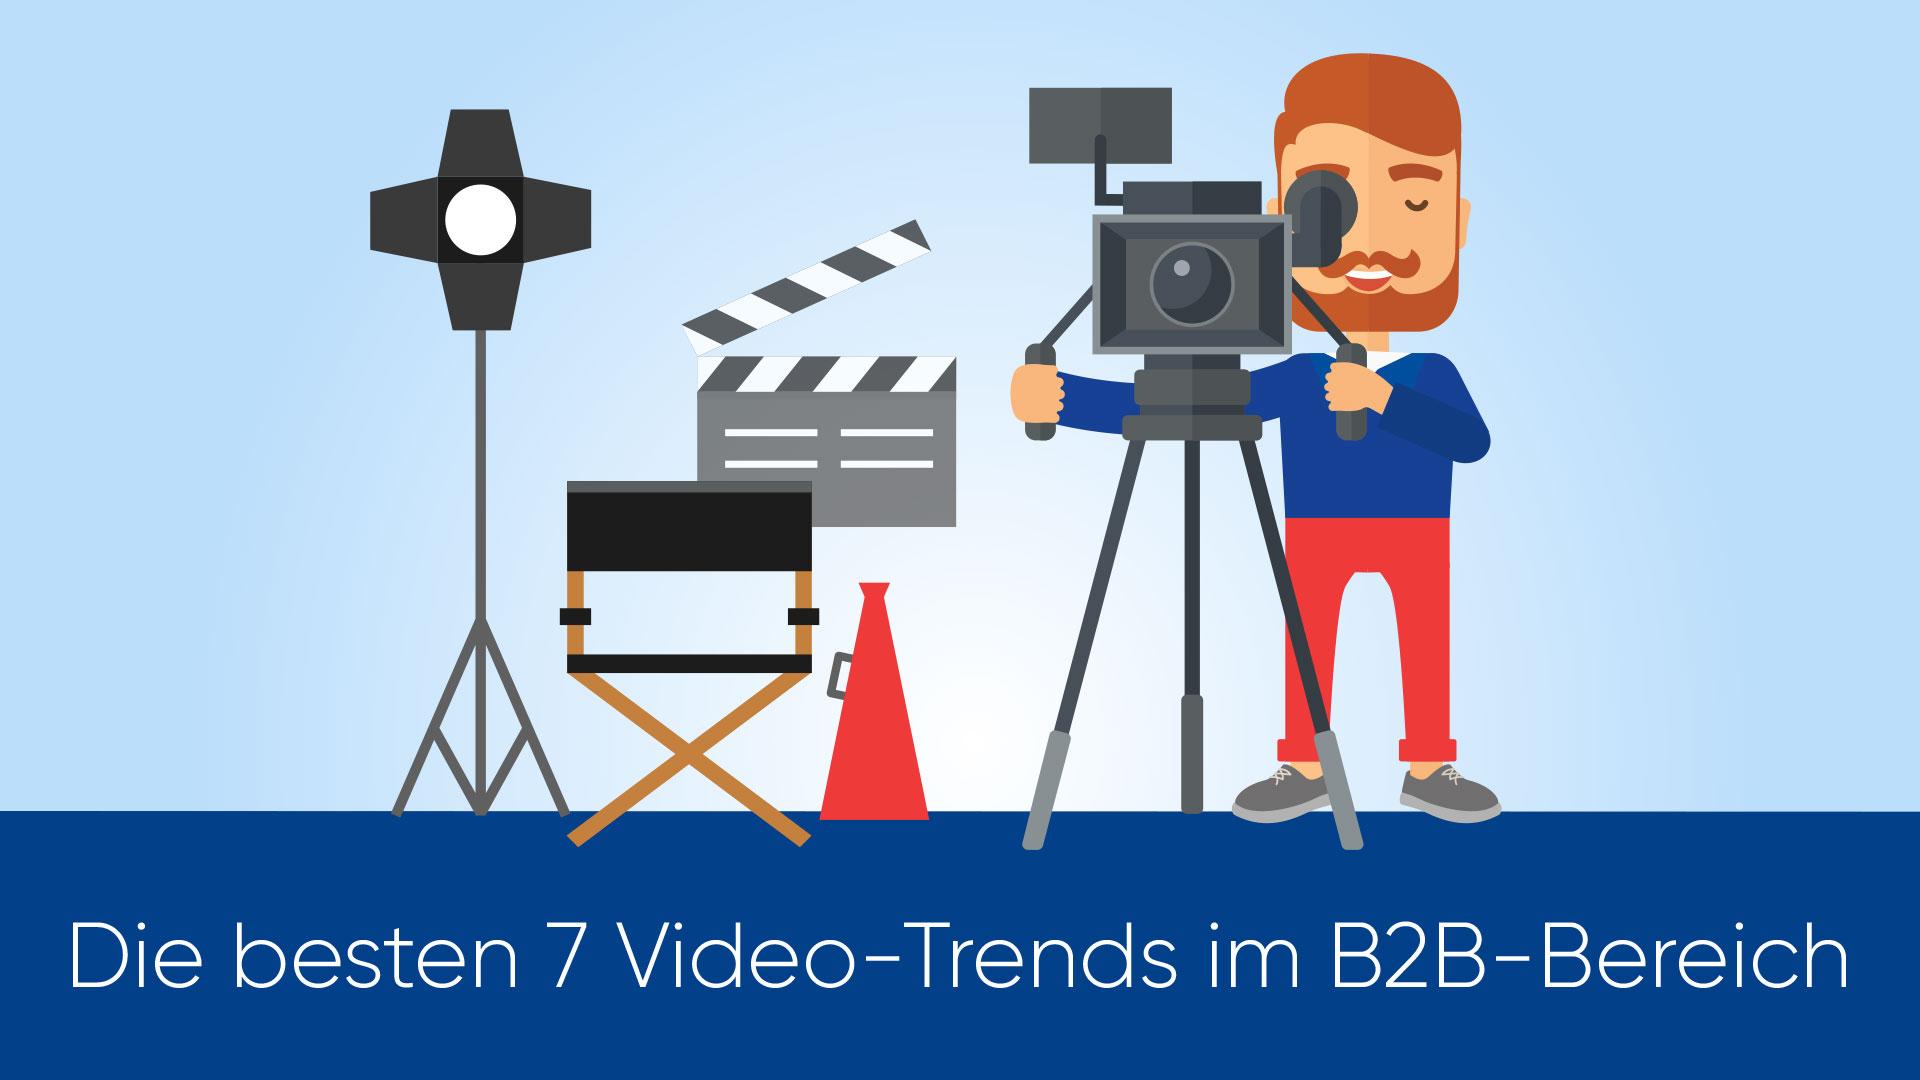 B2B Video-Trends